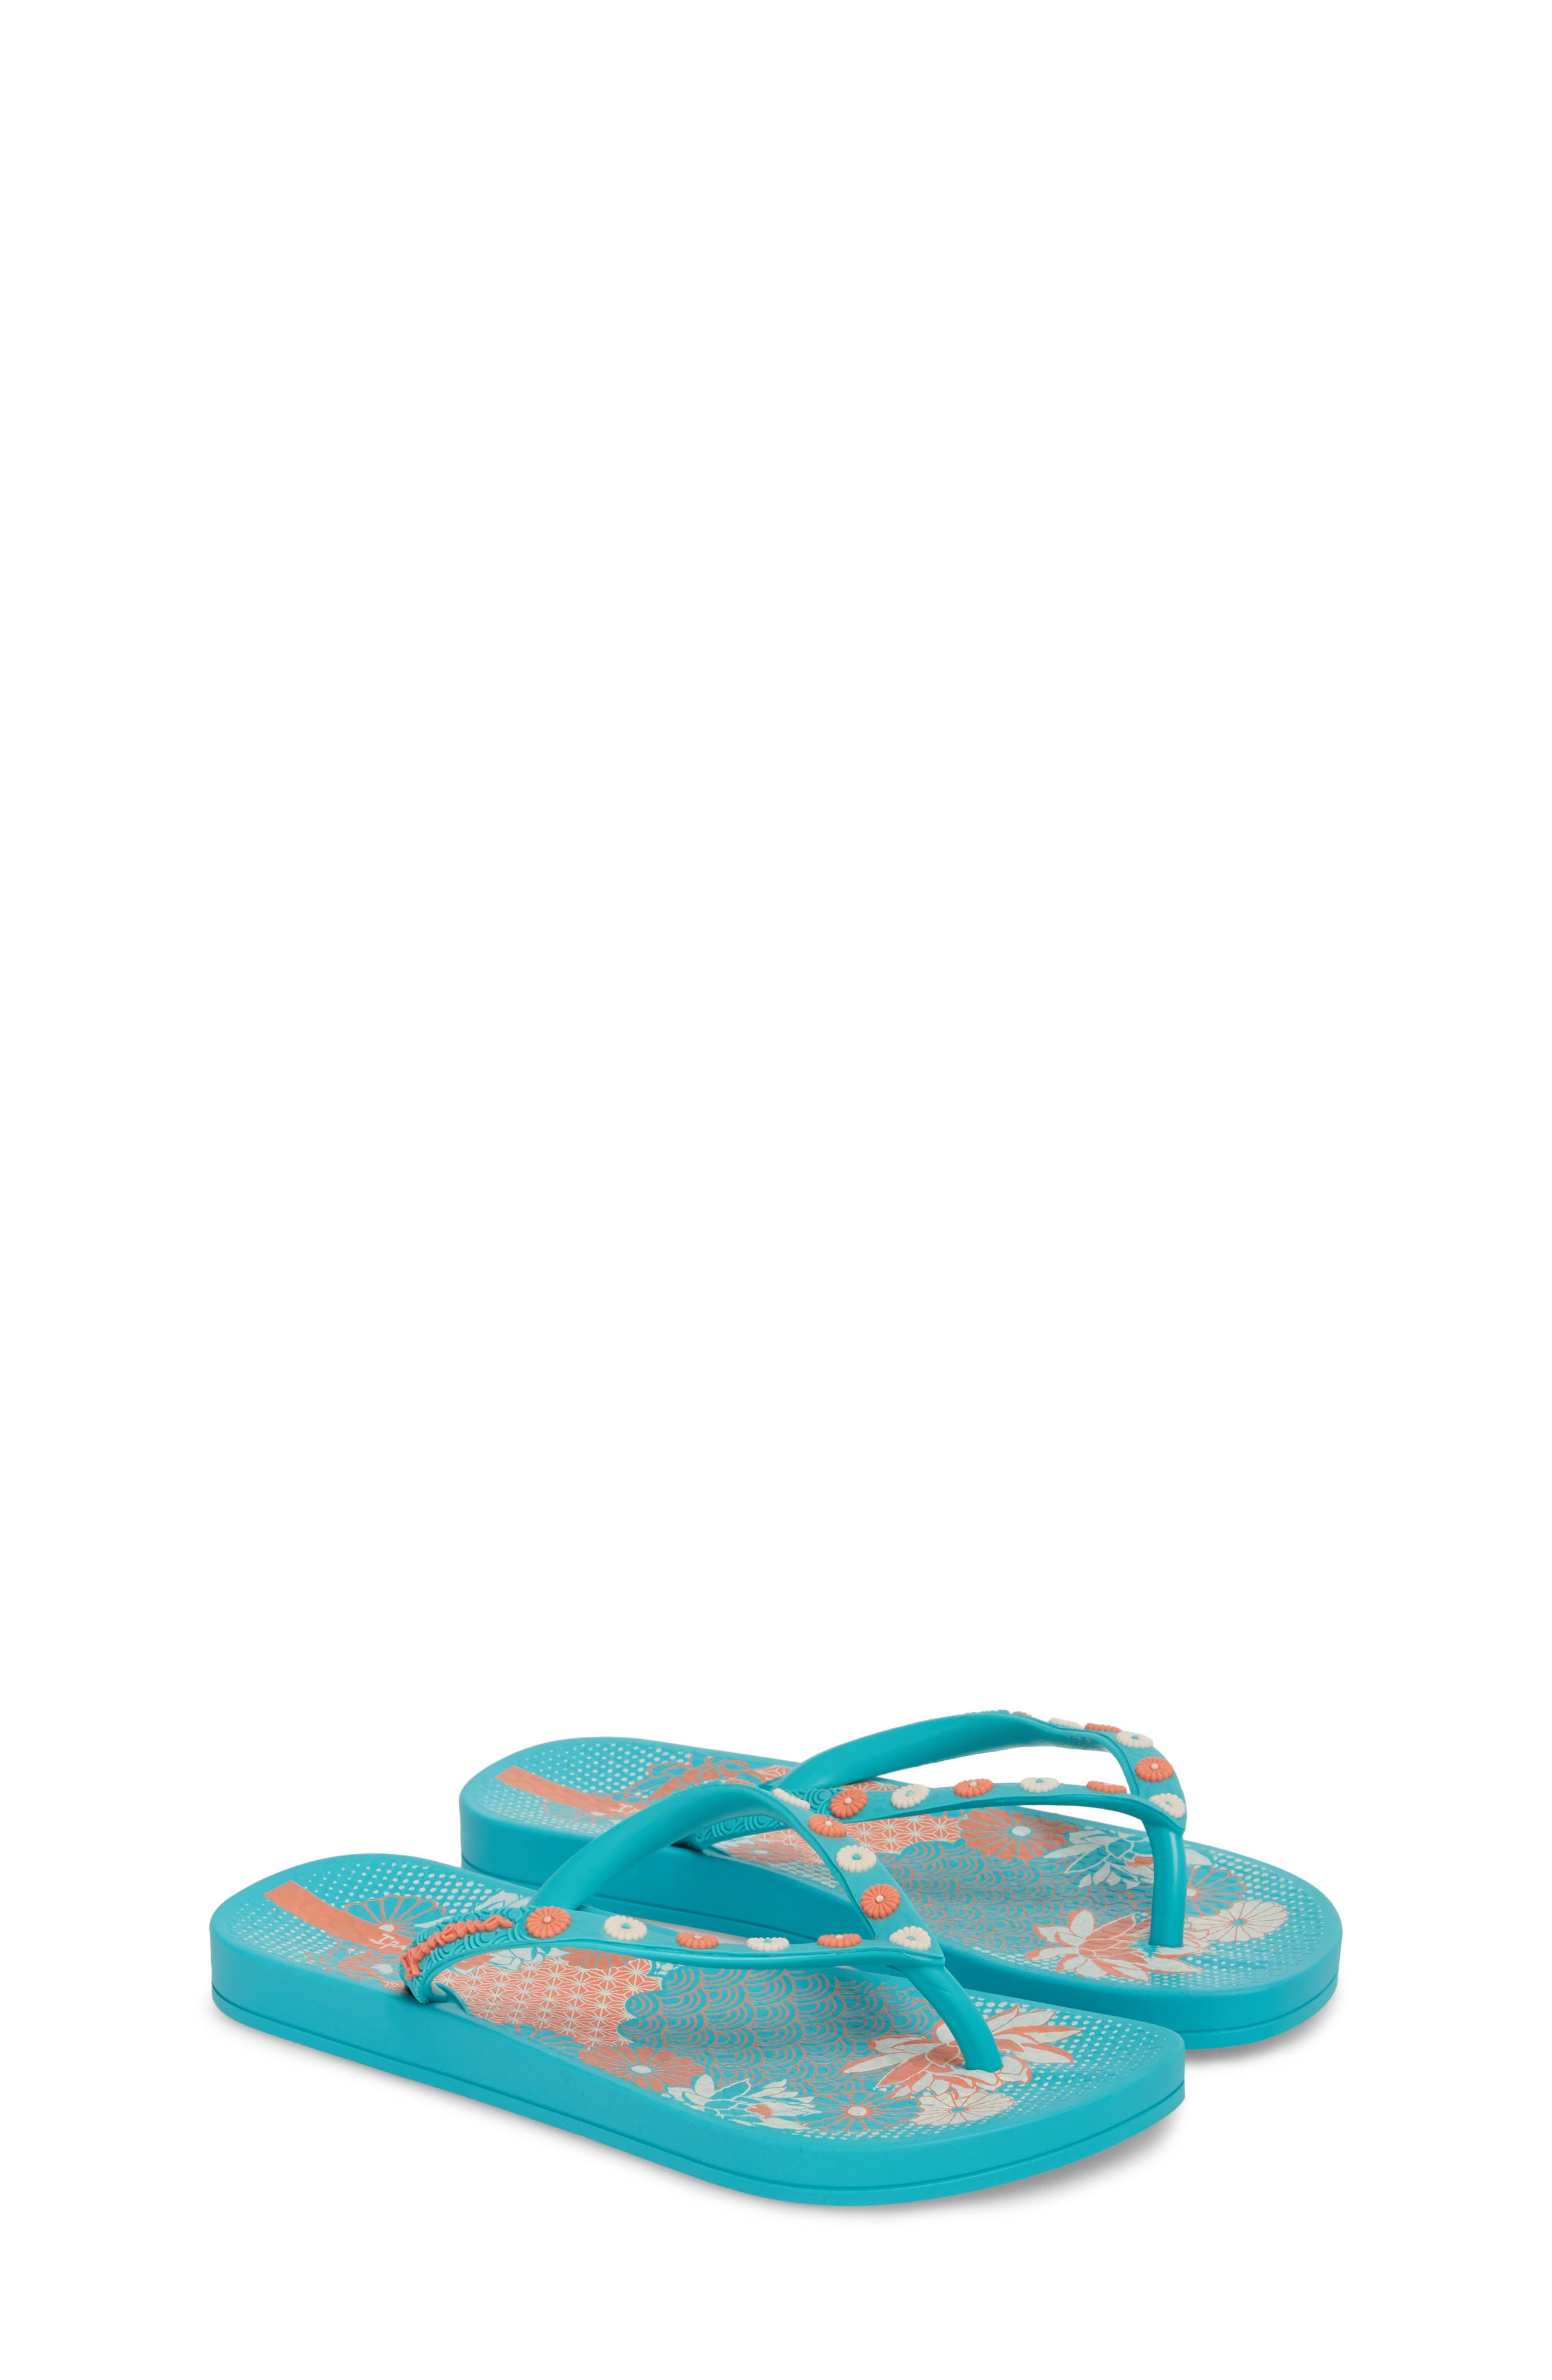 Ana Lovely Flip Flop,                             Alternate thumbnail 3, color,                             Blue